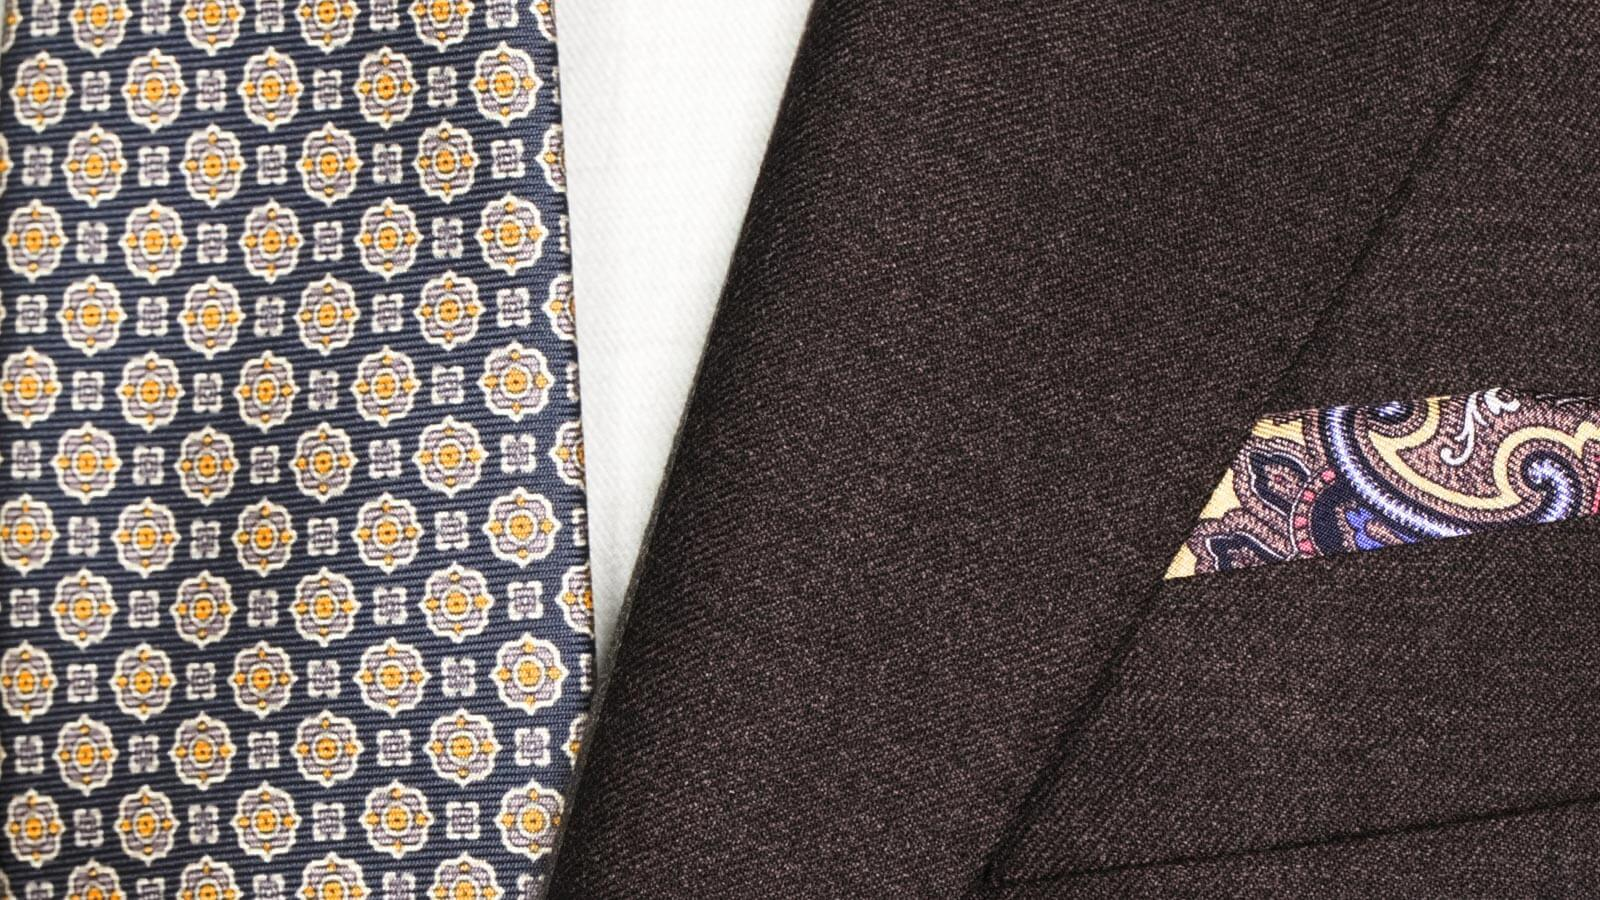 Worsted Chine Dark Brown Suit - slider image 1